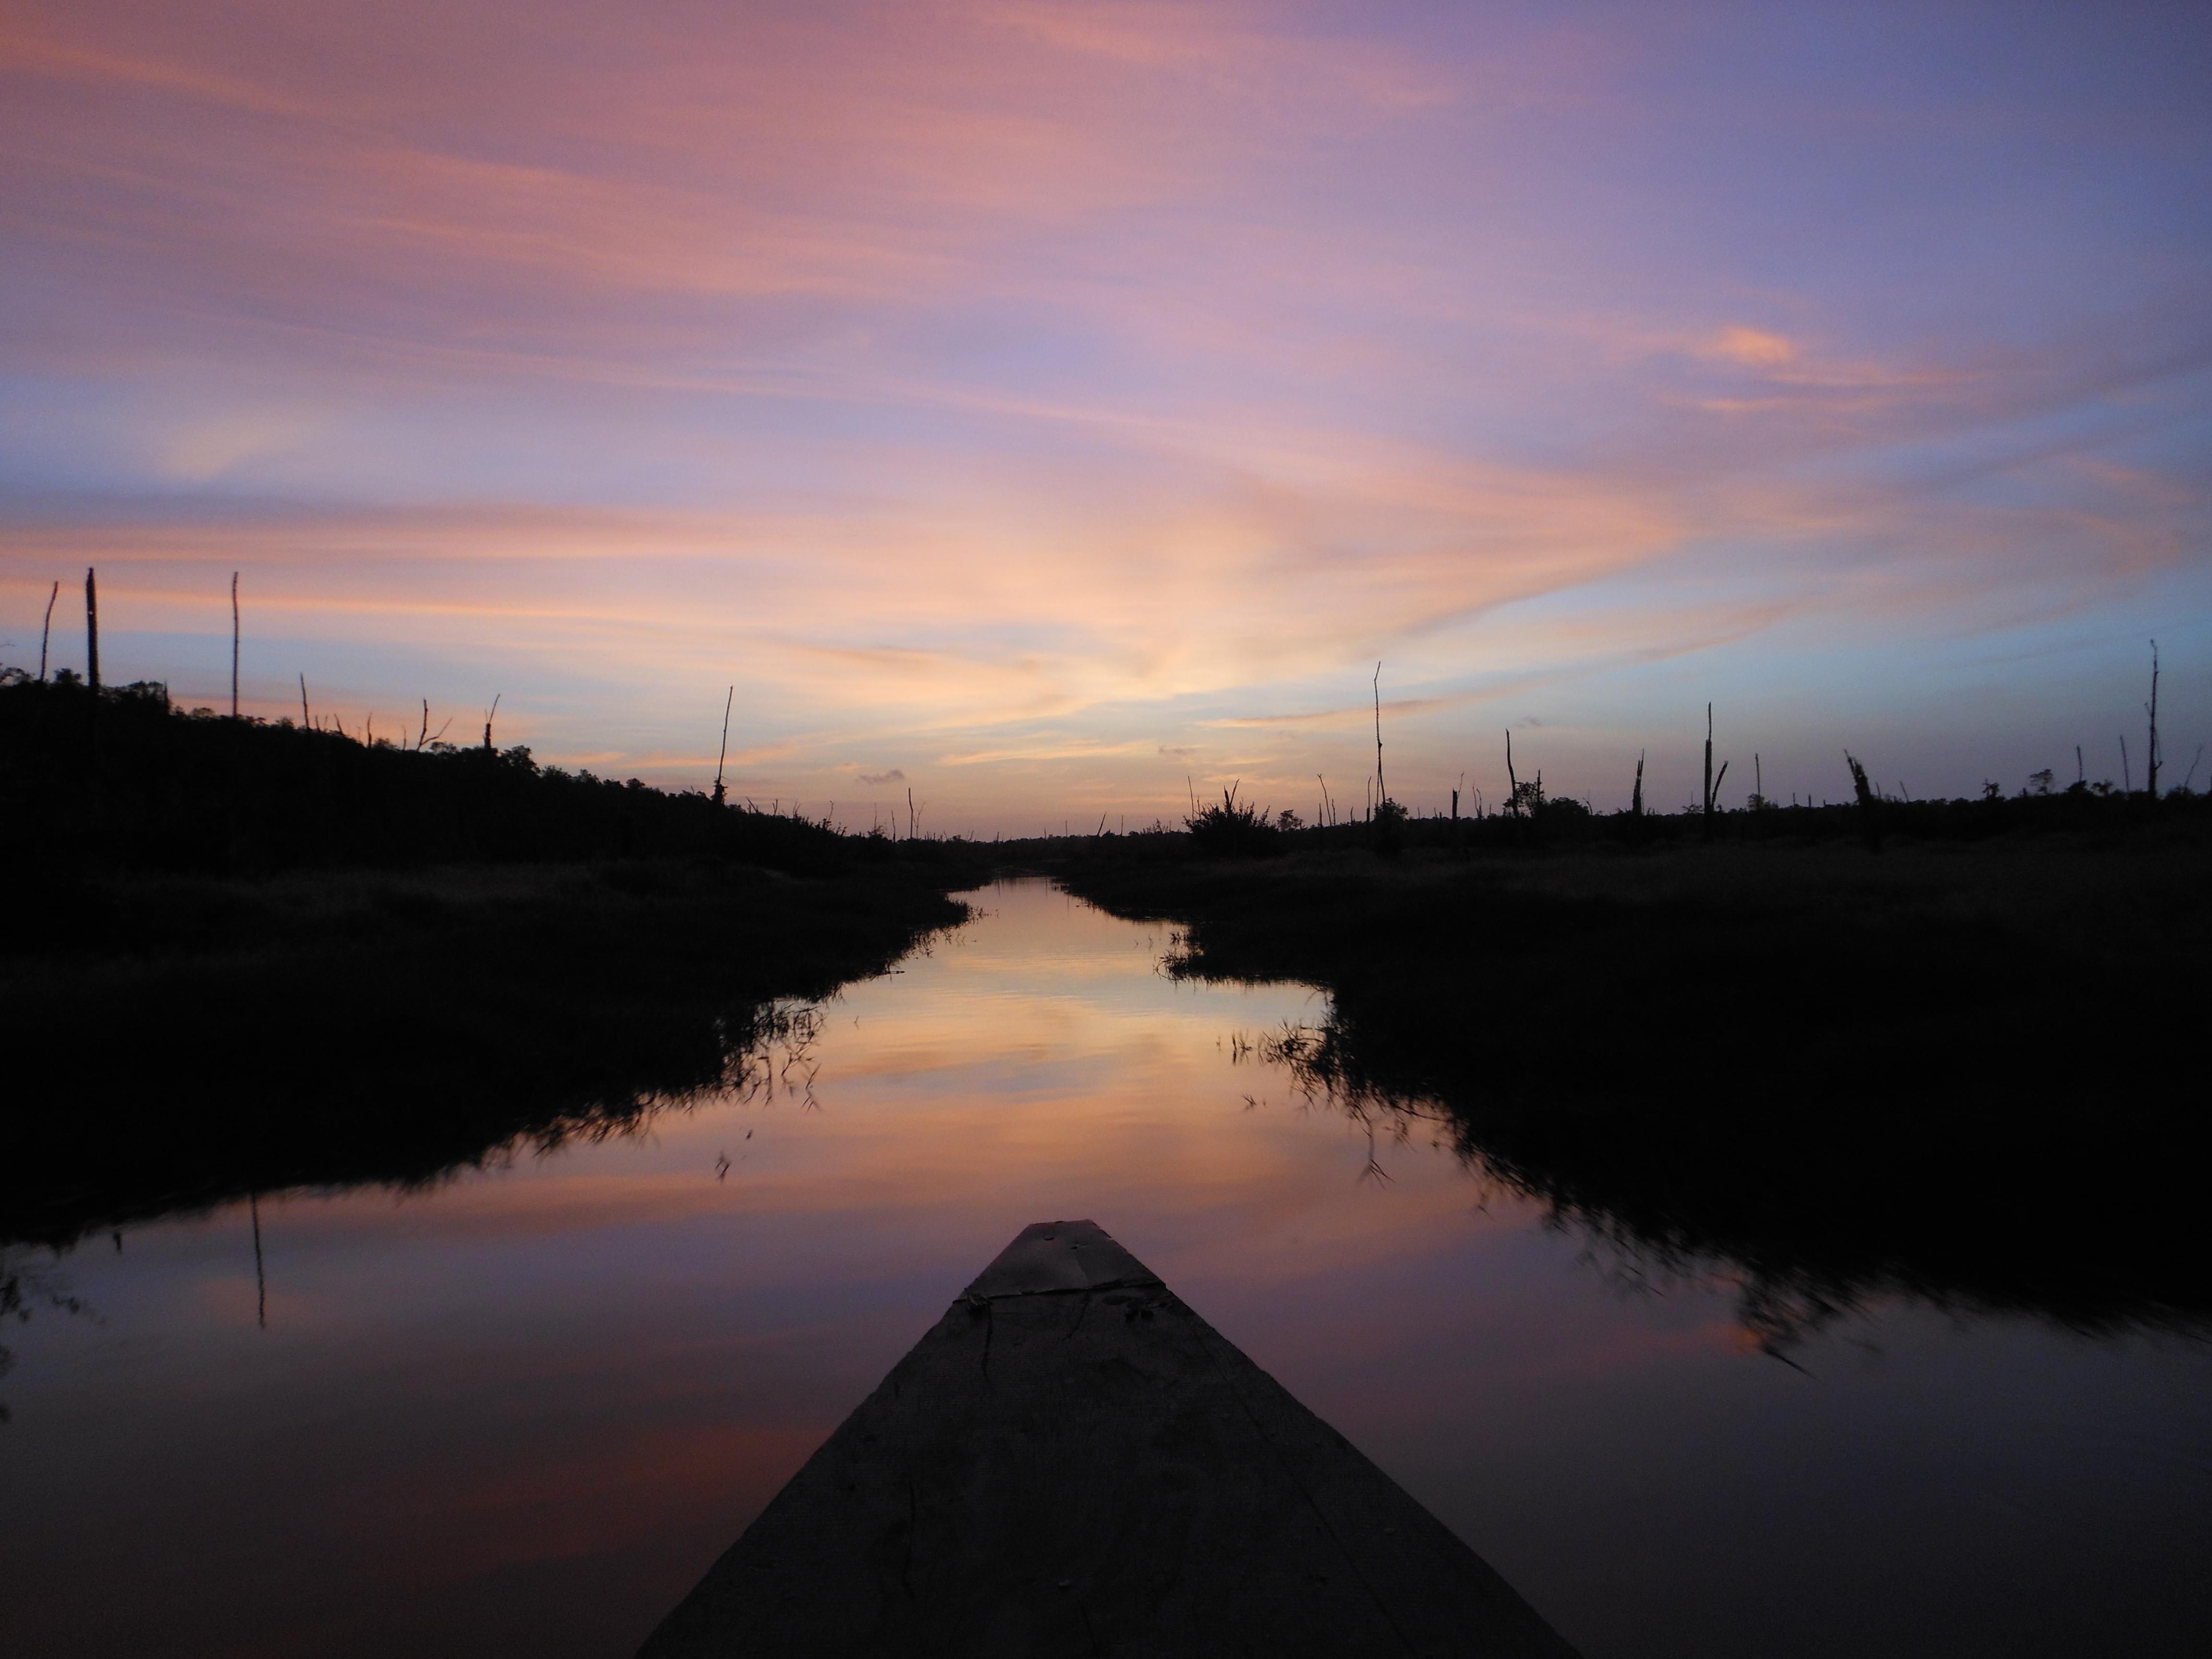 Suriname Blog #4: Bakra's in the swamp